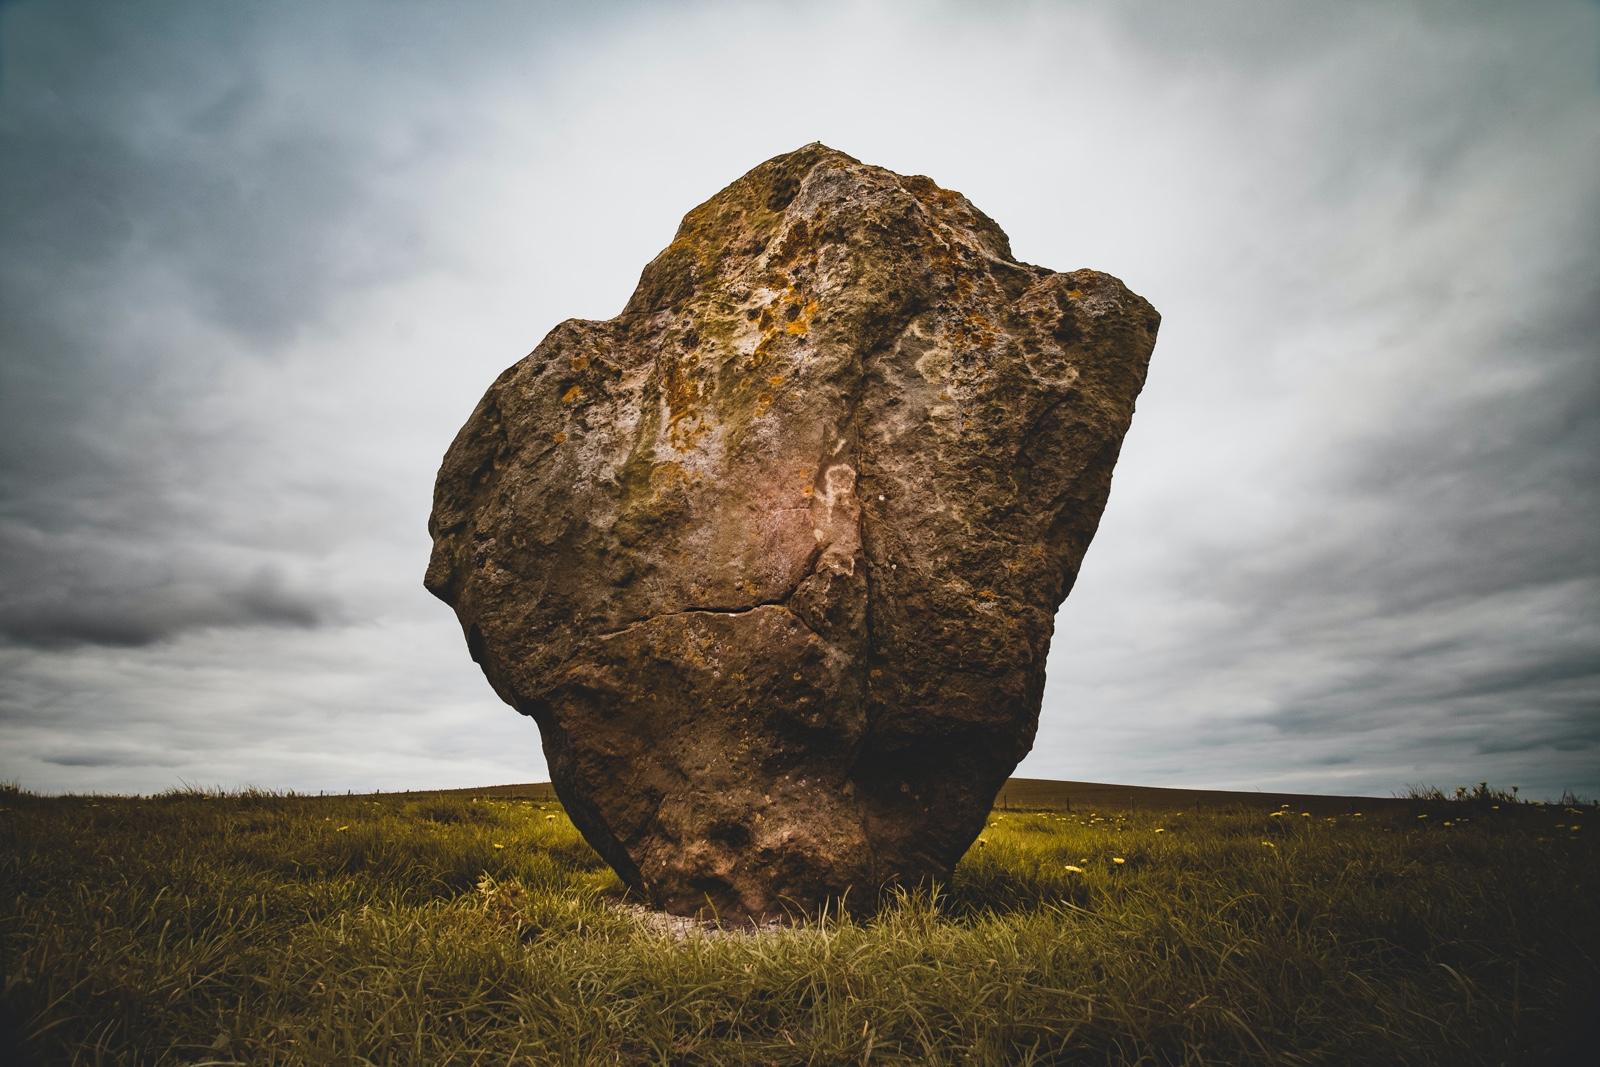 Large durable rock